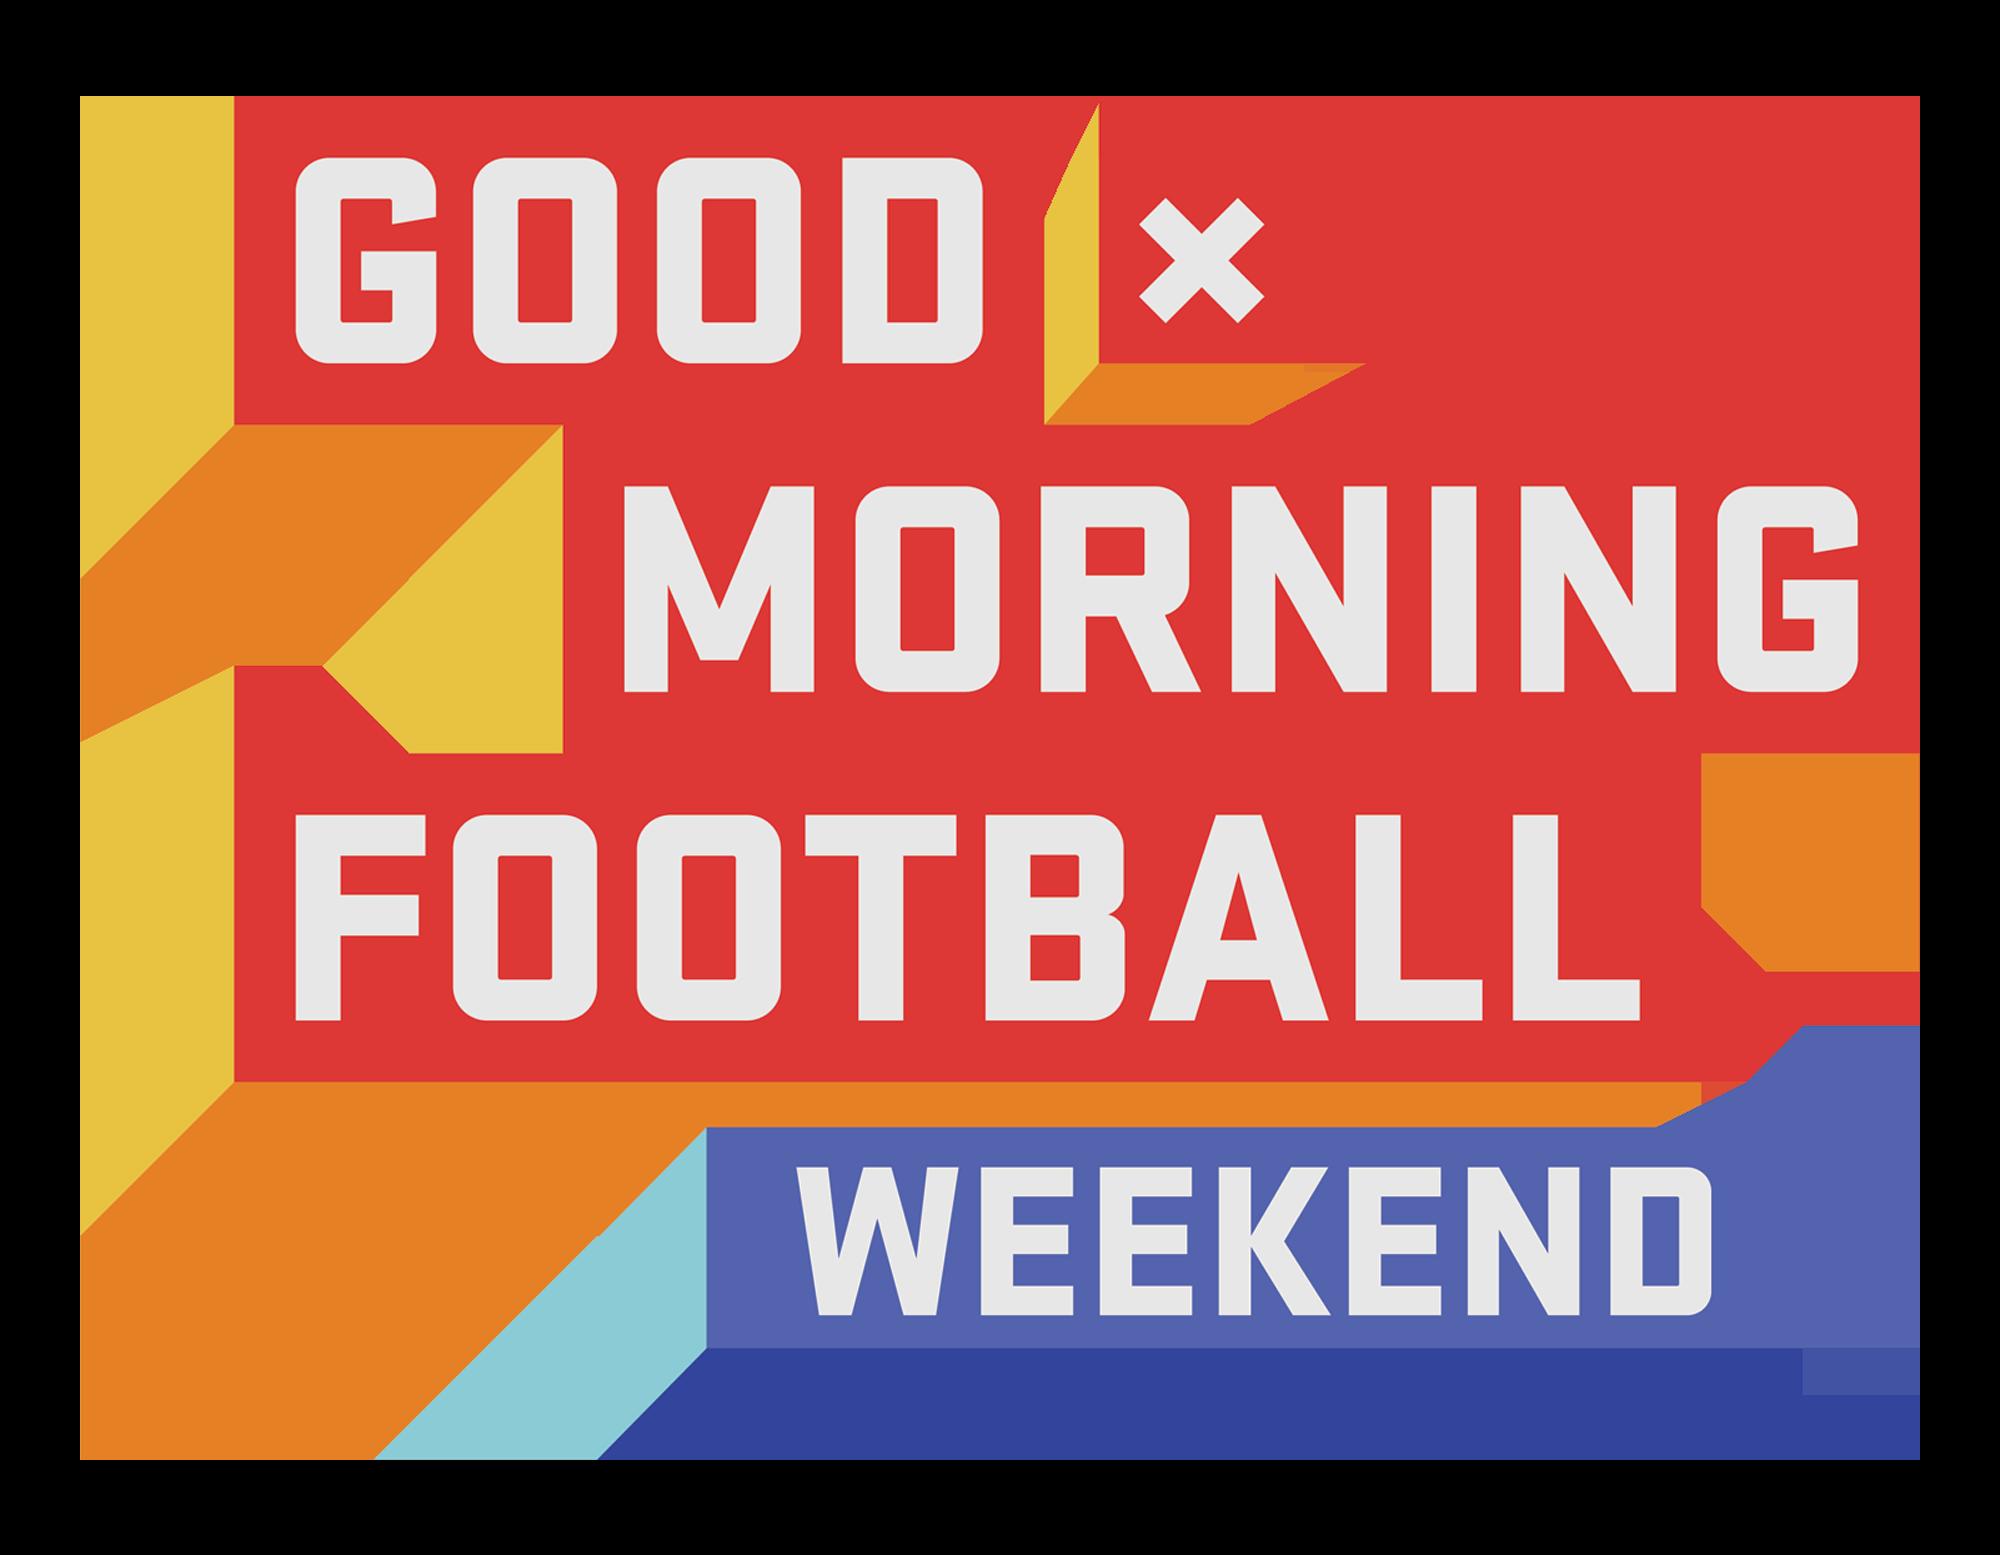 GOOD MORNING FOOTBALL WEEKEND | SATURDAYS 9AM ET